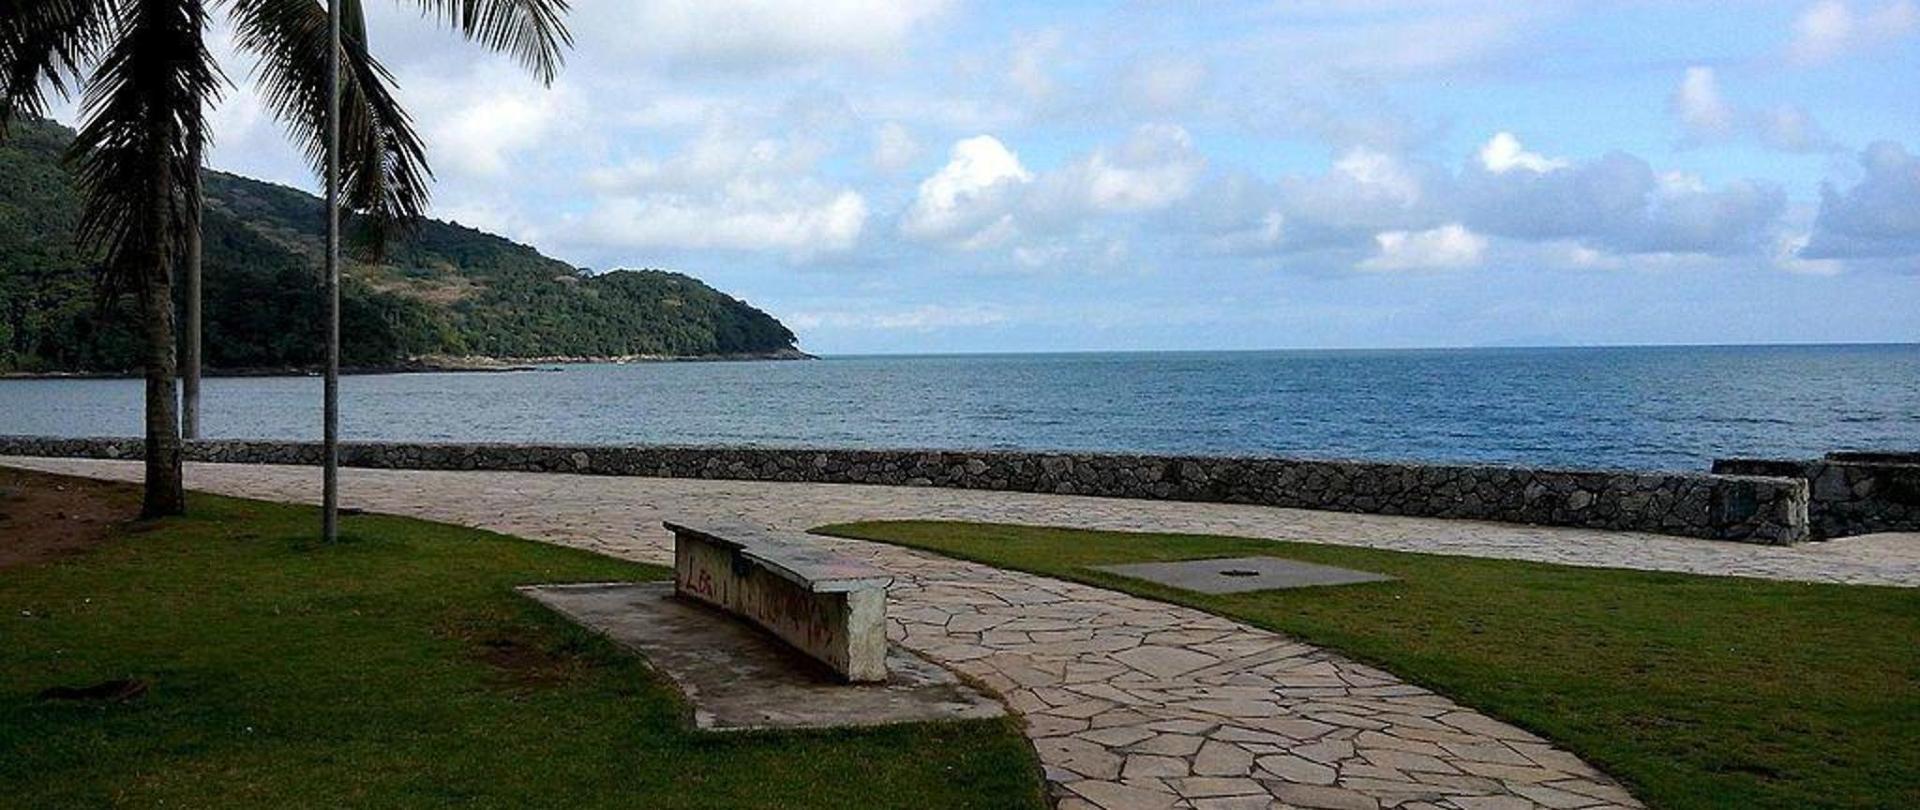 s-o_sebasti-o_-_praia_de_boi-ucanga_-_panoramio_-7-1.jpg